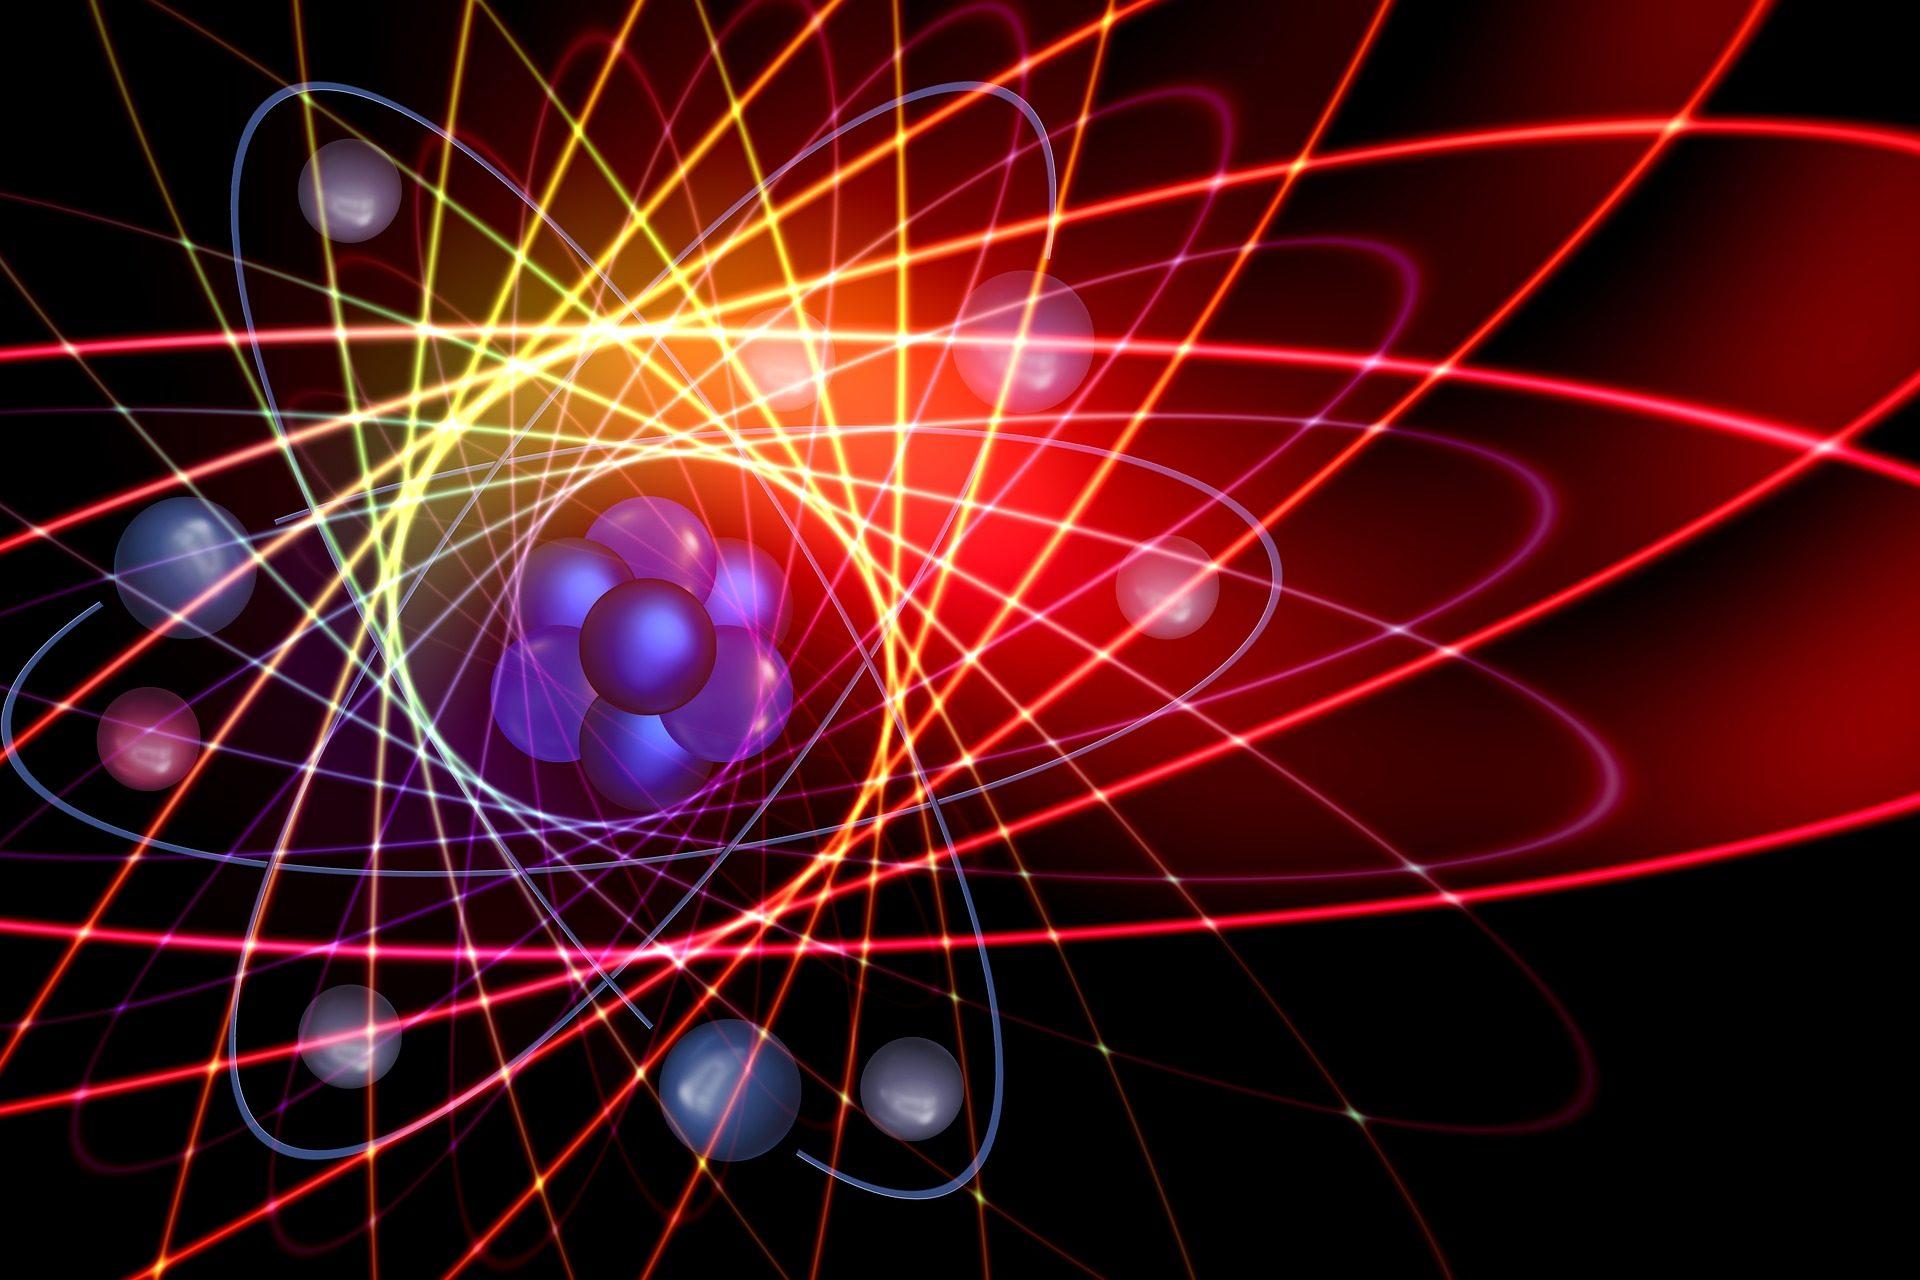 physics-3871218_1920.jpg